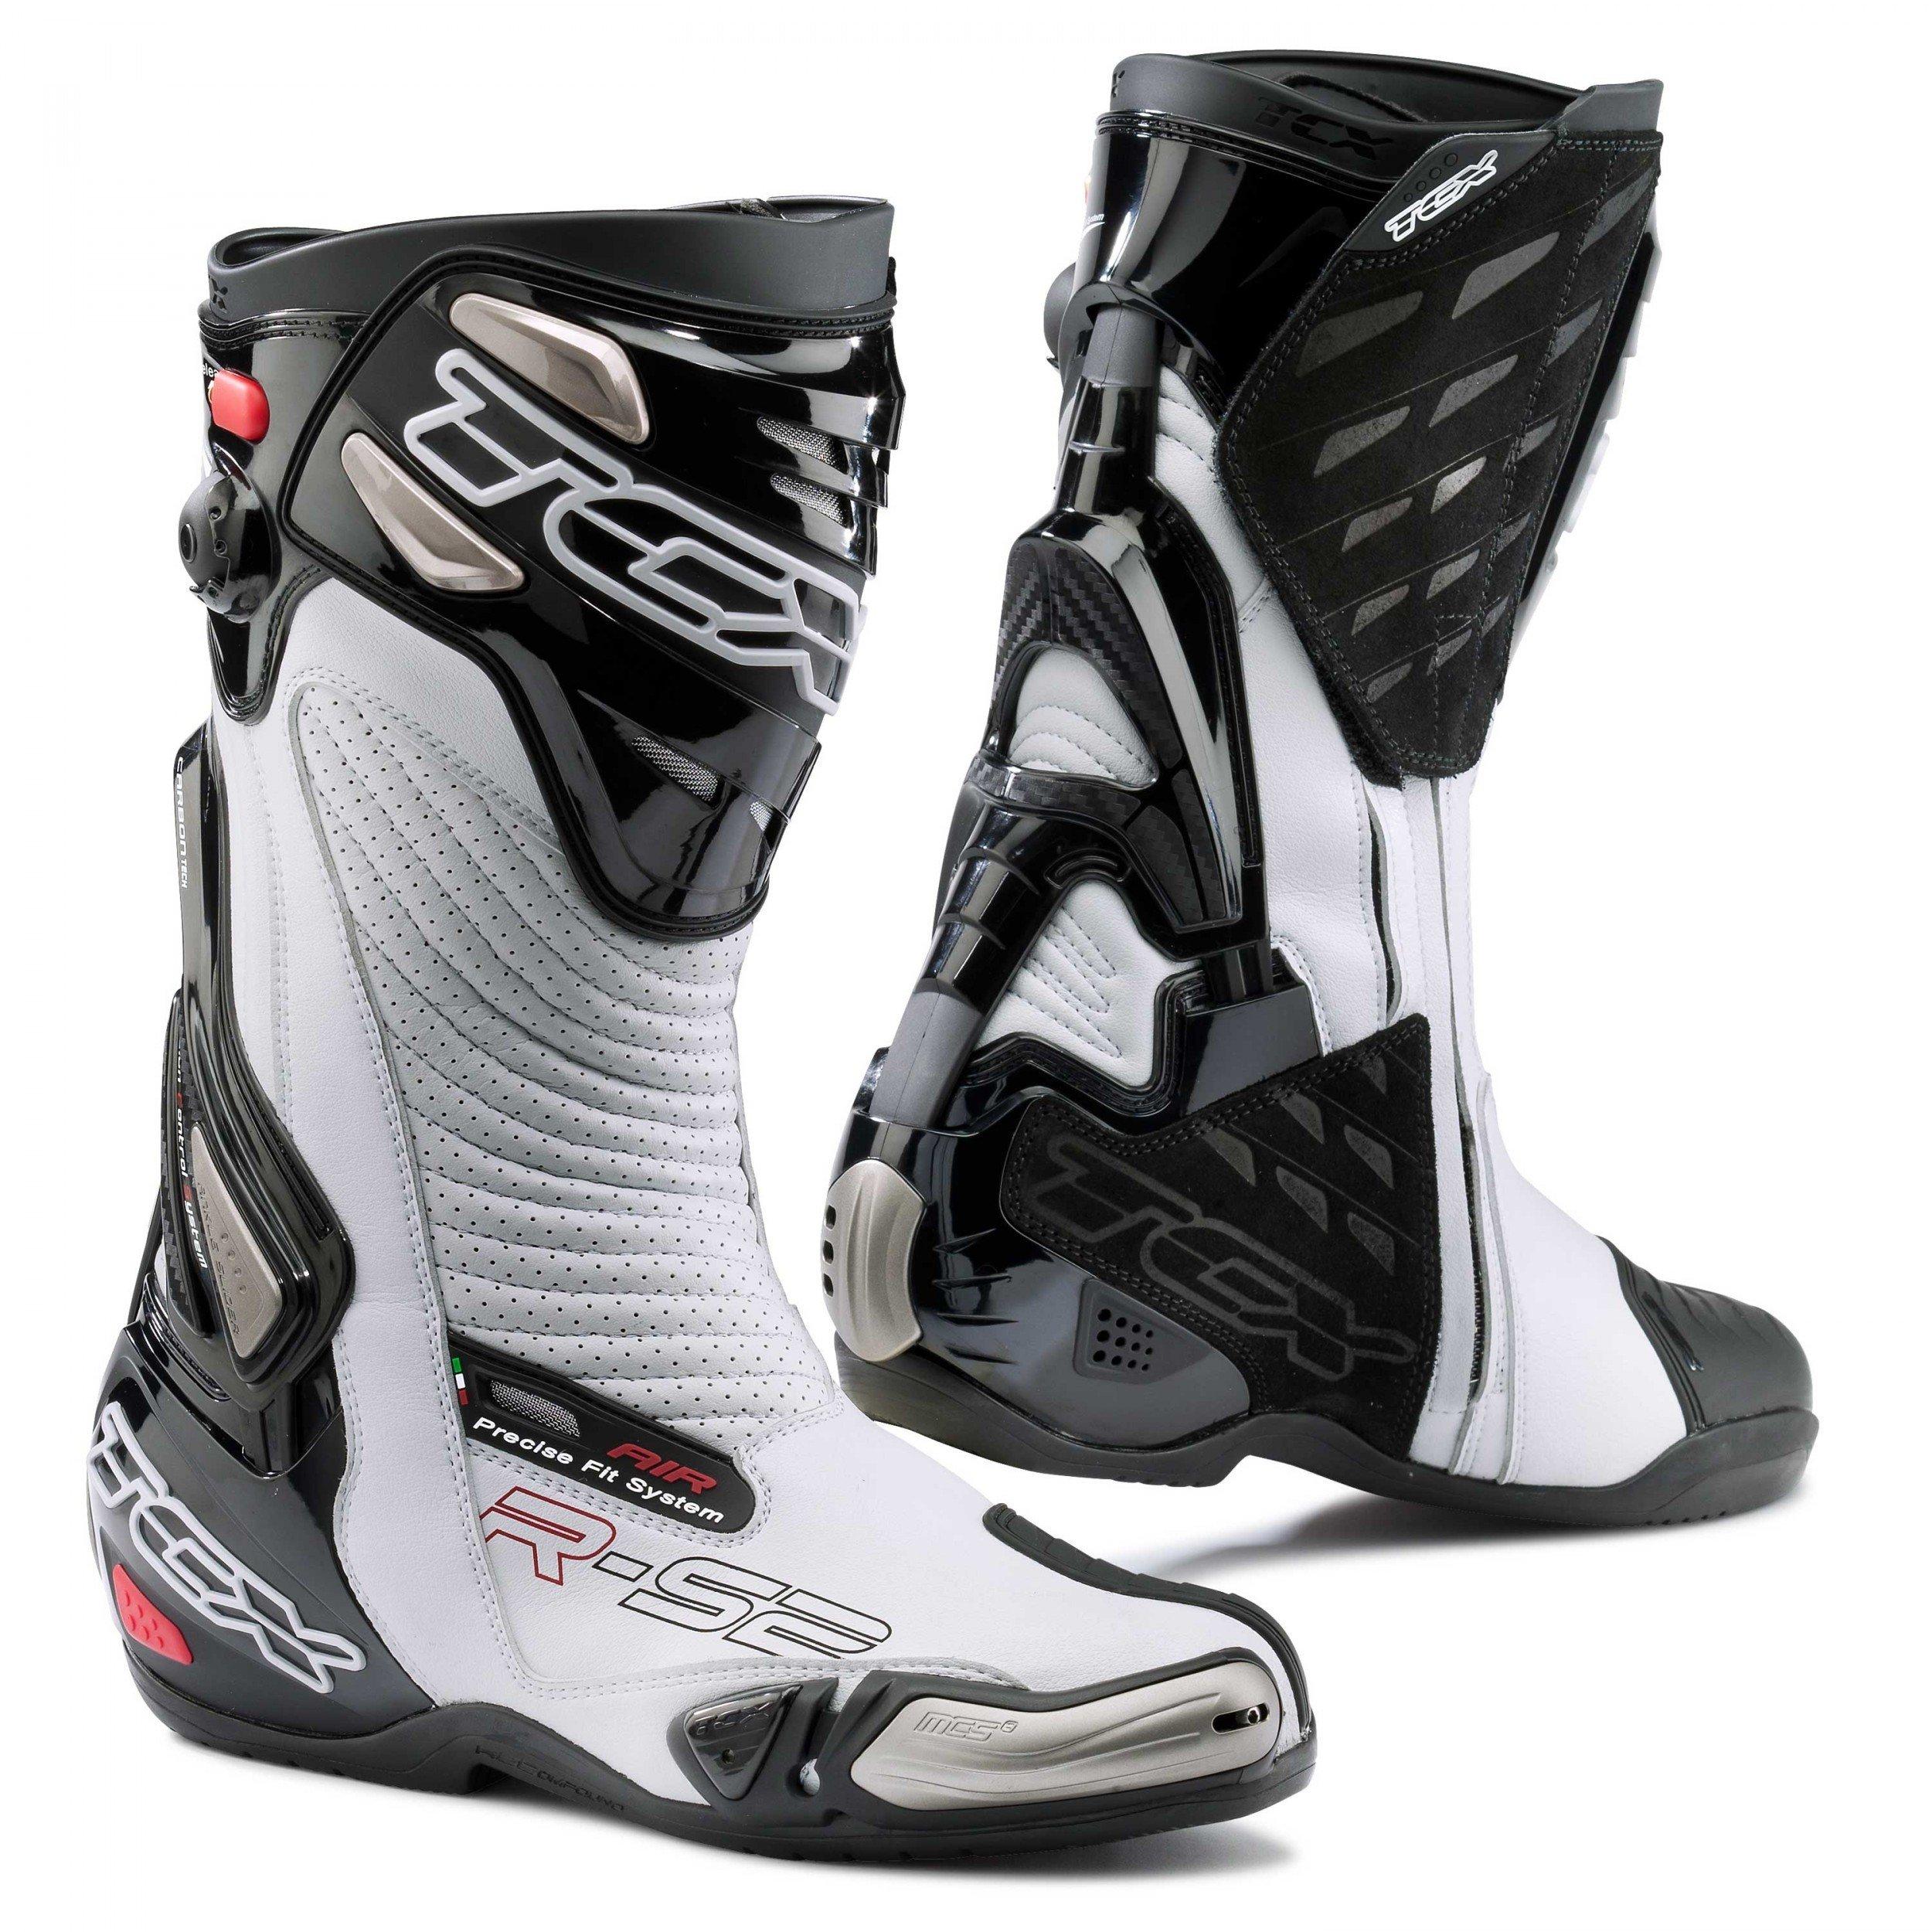 TCX RS2 White/Black 43